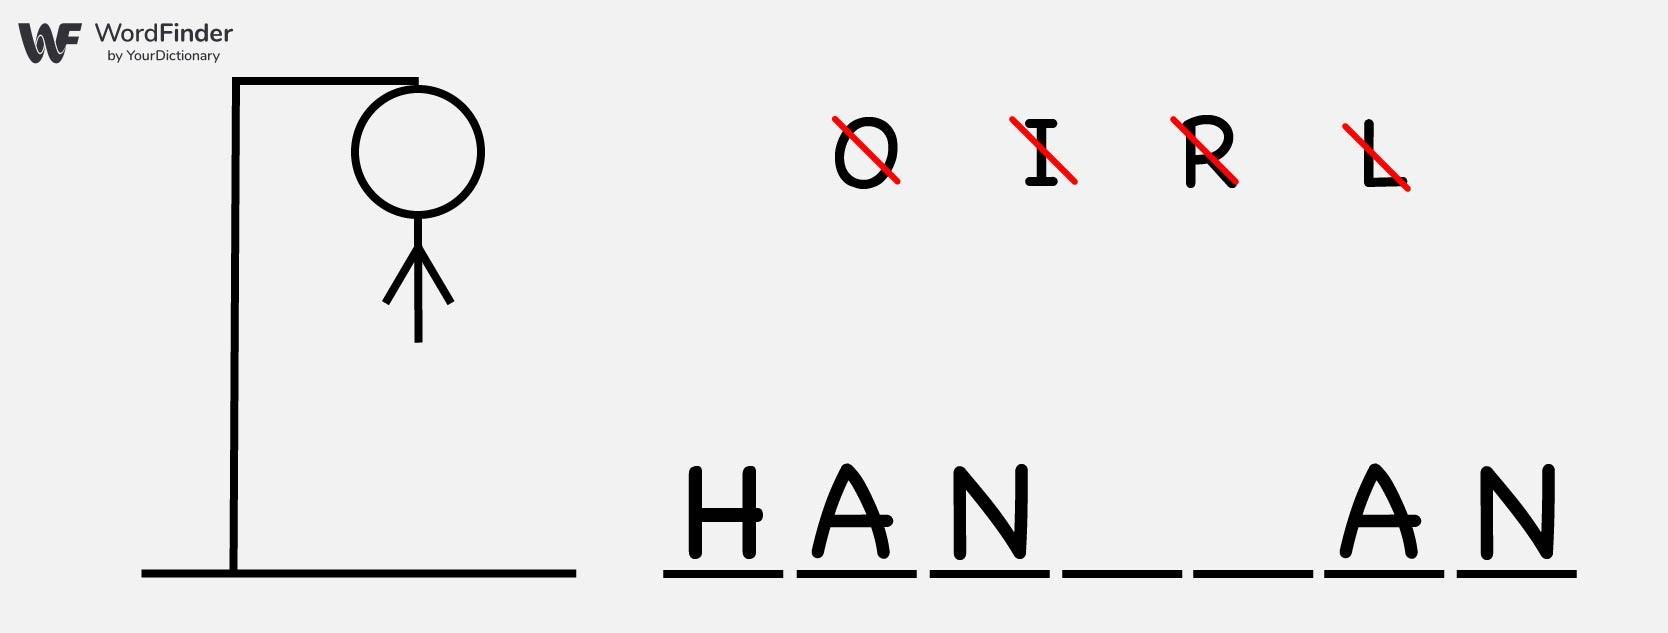 hangman word game on paper